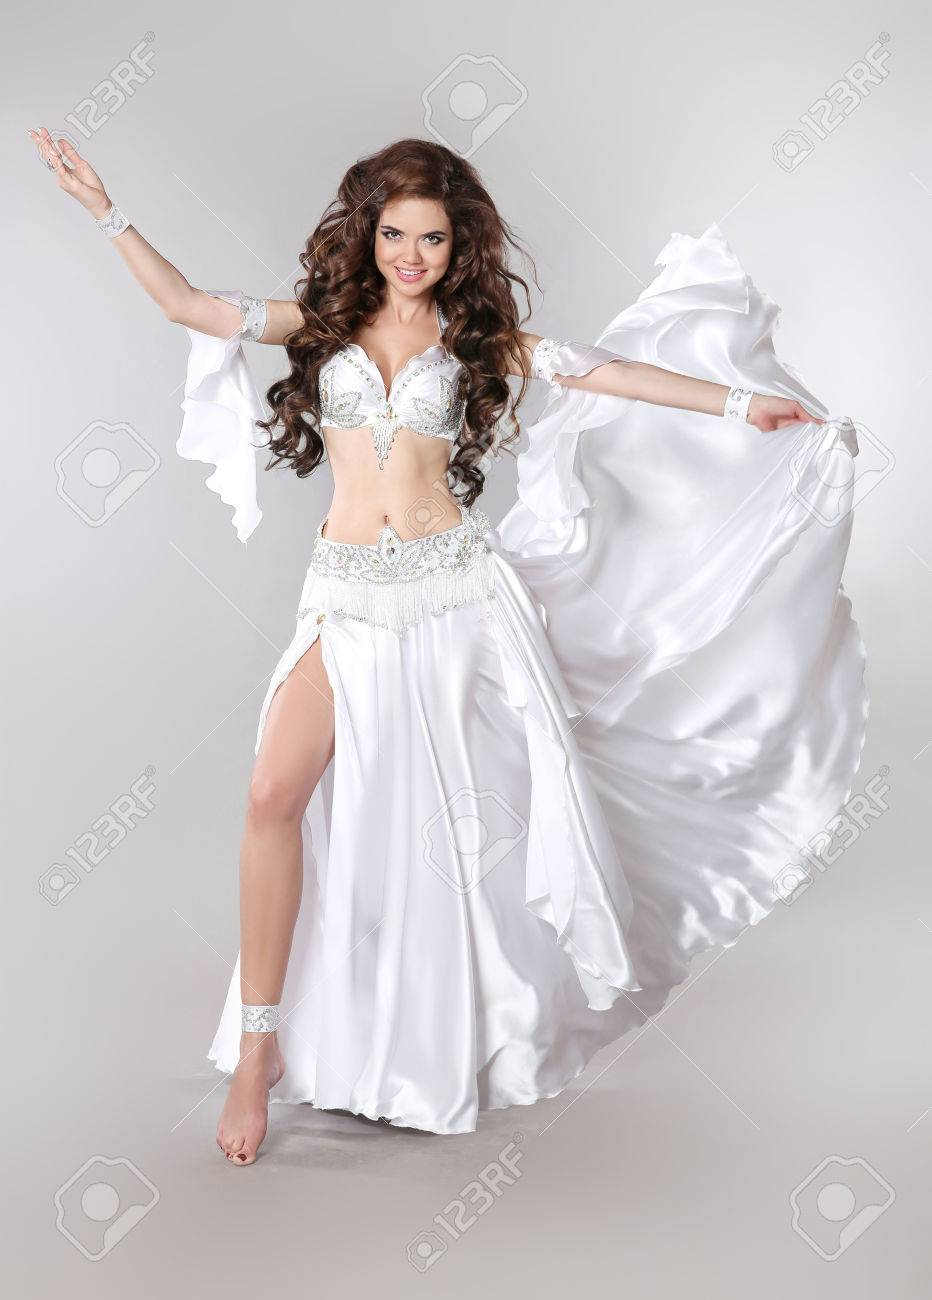 4bb768cc04e85 Belly dance. Bellydancer. Beautiful brunette Gorgeous Arabian Woman dancer  with long curly hair posing